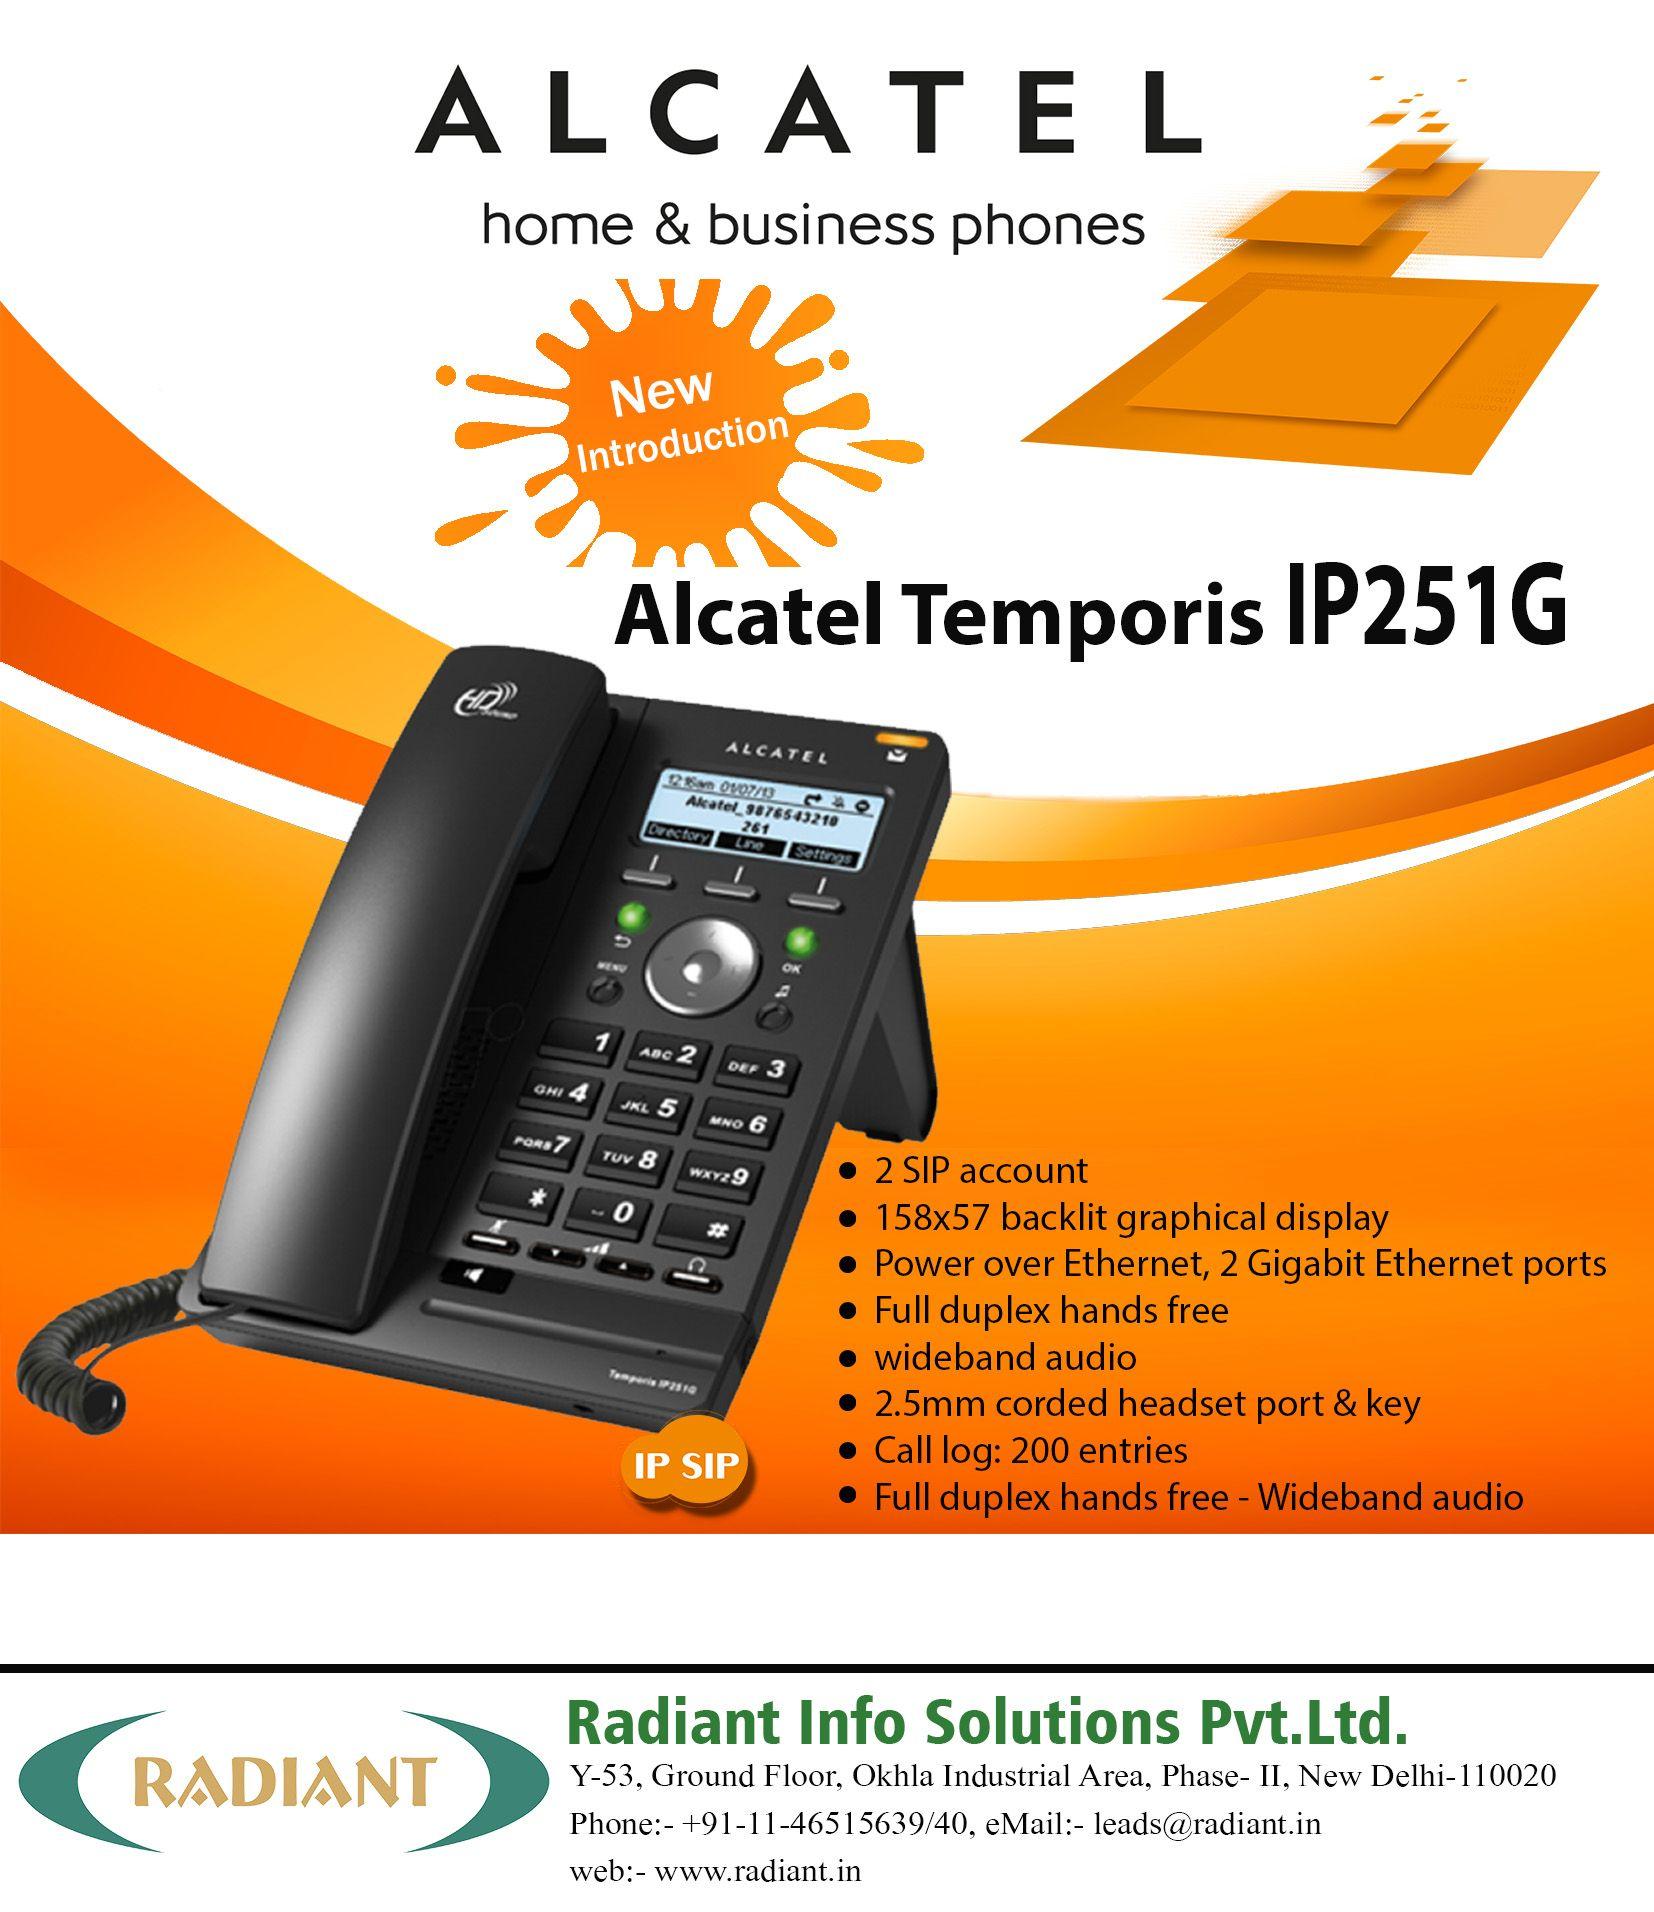 ALCATEL Home and Business IP Phone - Alcatel Temporis IP251G.  #Alcatel #IP #Phone #India #Voip #HomePhone #BusinessPhone #Radiant #AlcatelPhones   #BusinessPhoneSystem #IPPhone #Telecommunication